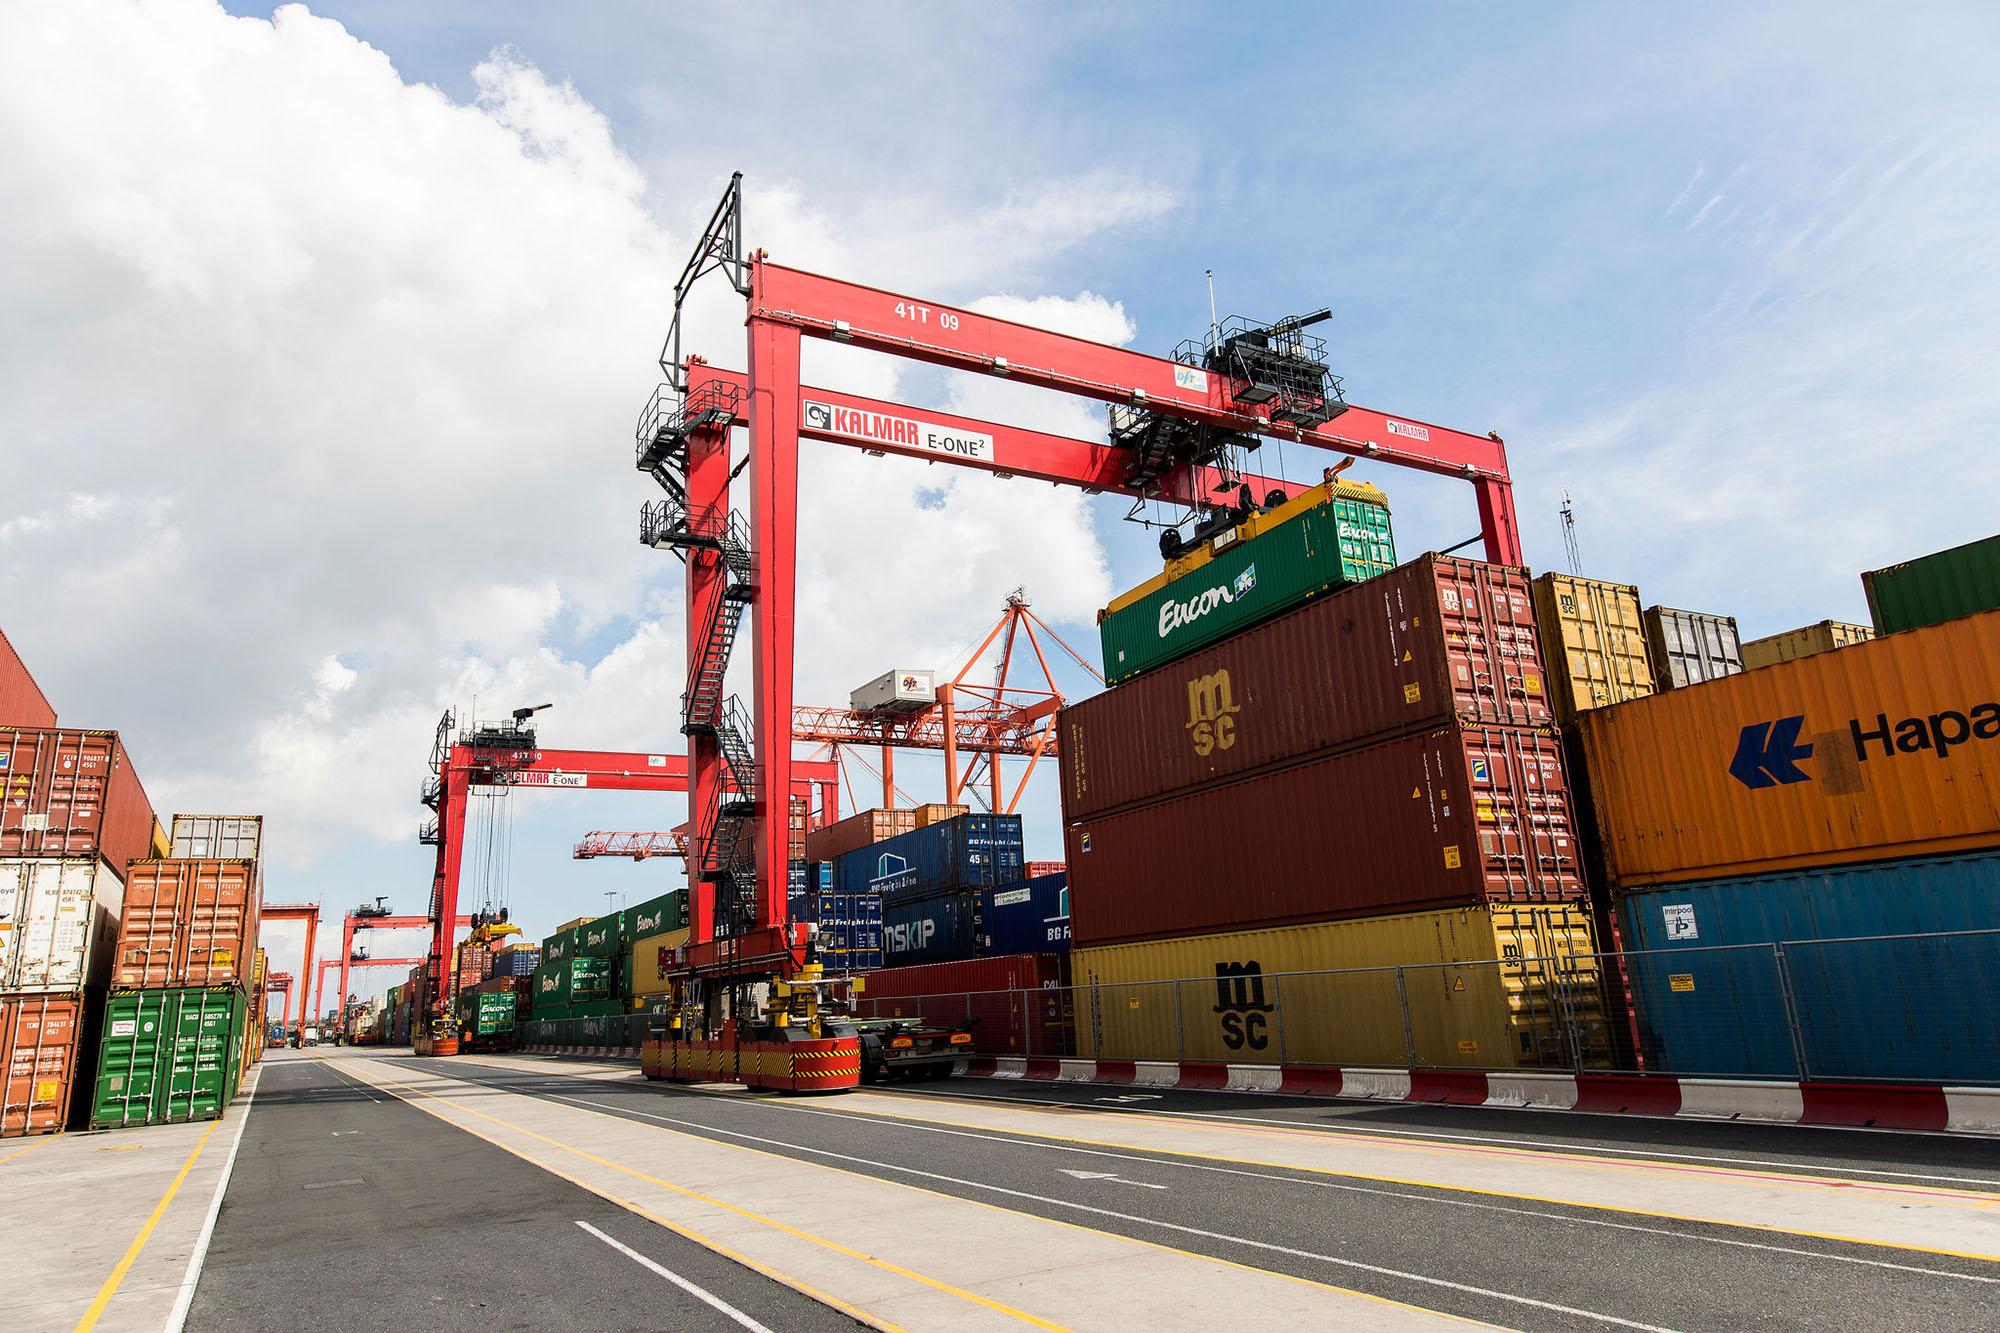 image-1-kalmar-autortgs-at-dublin-ferryport-terminals-